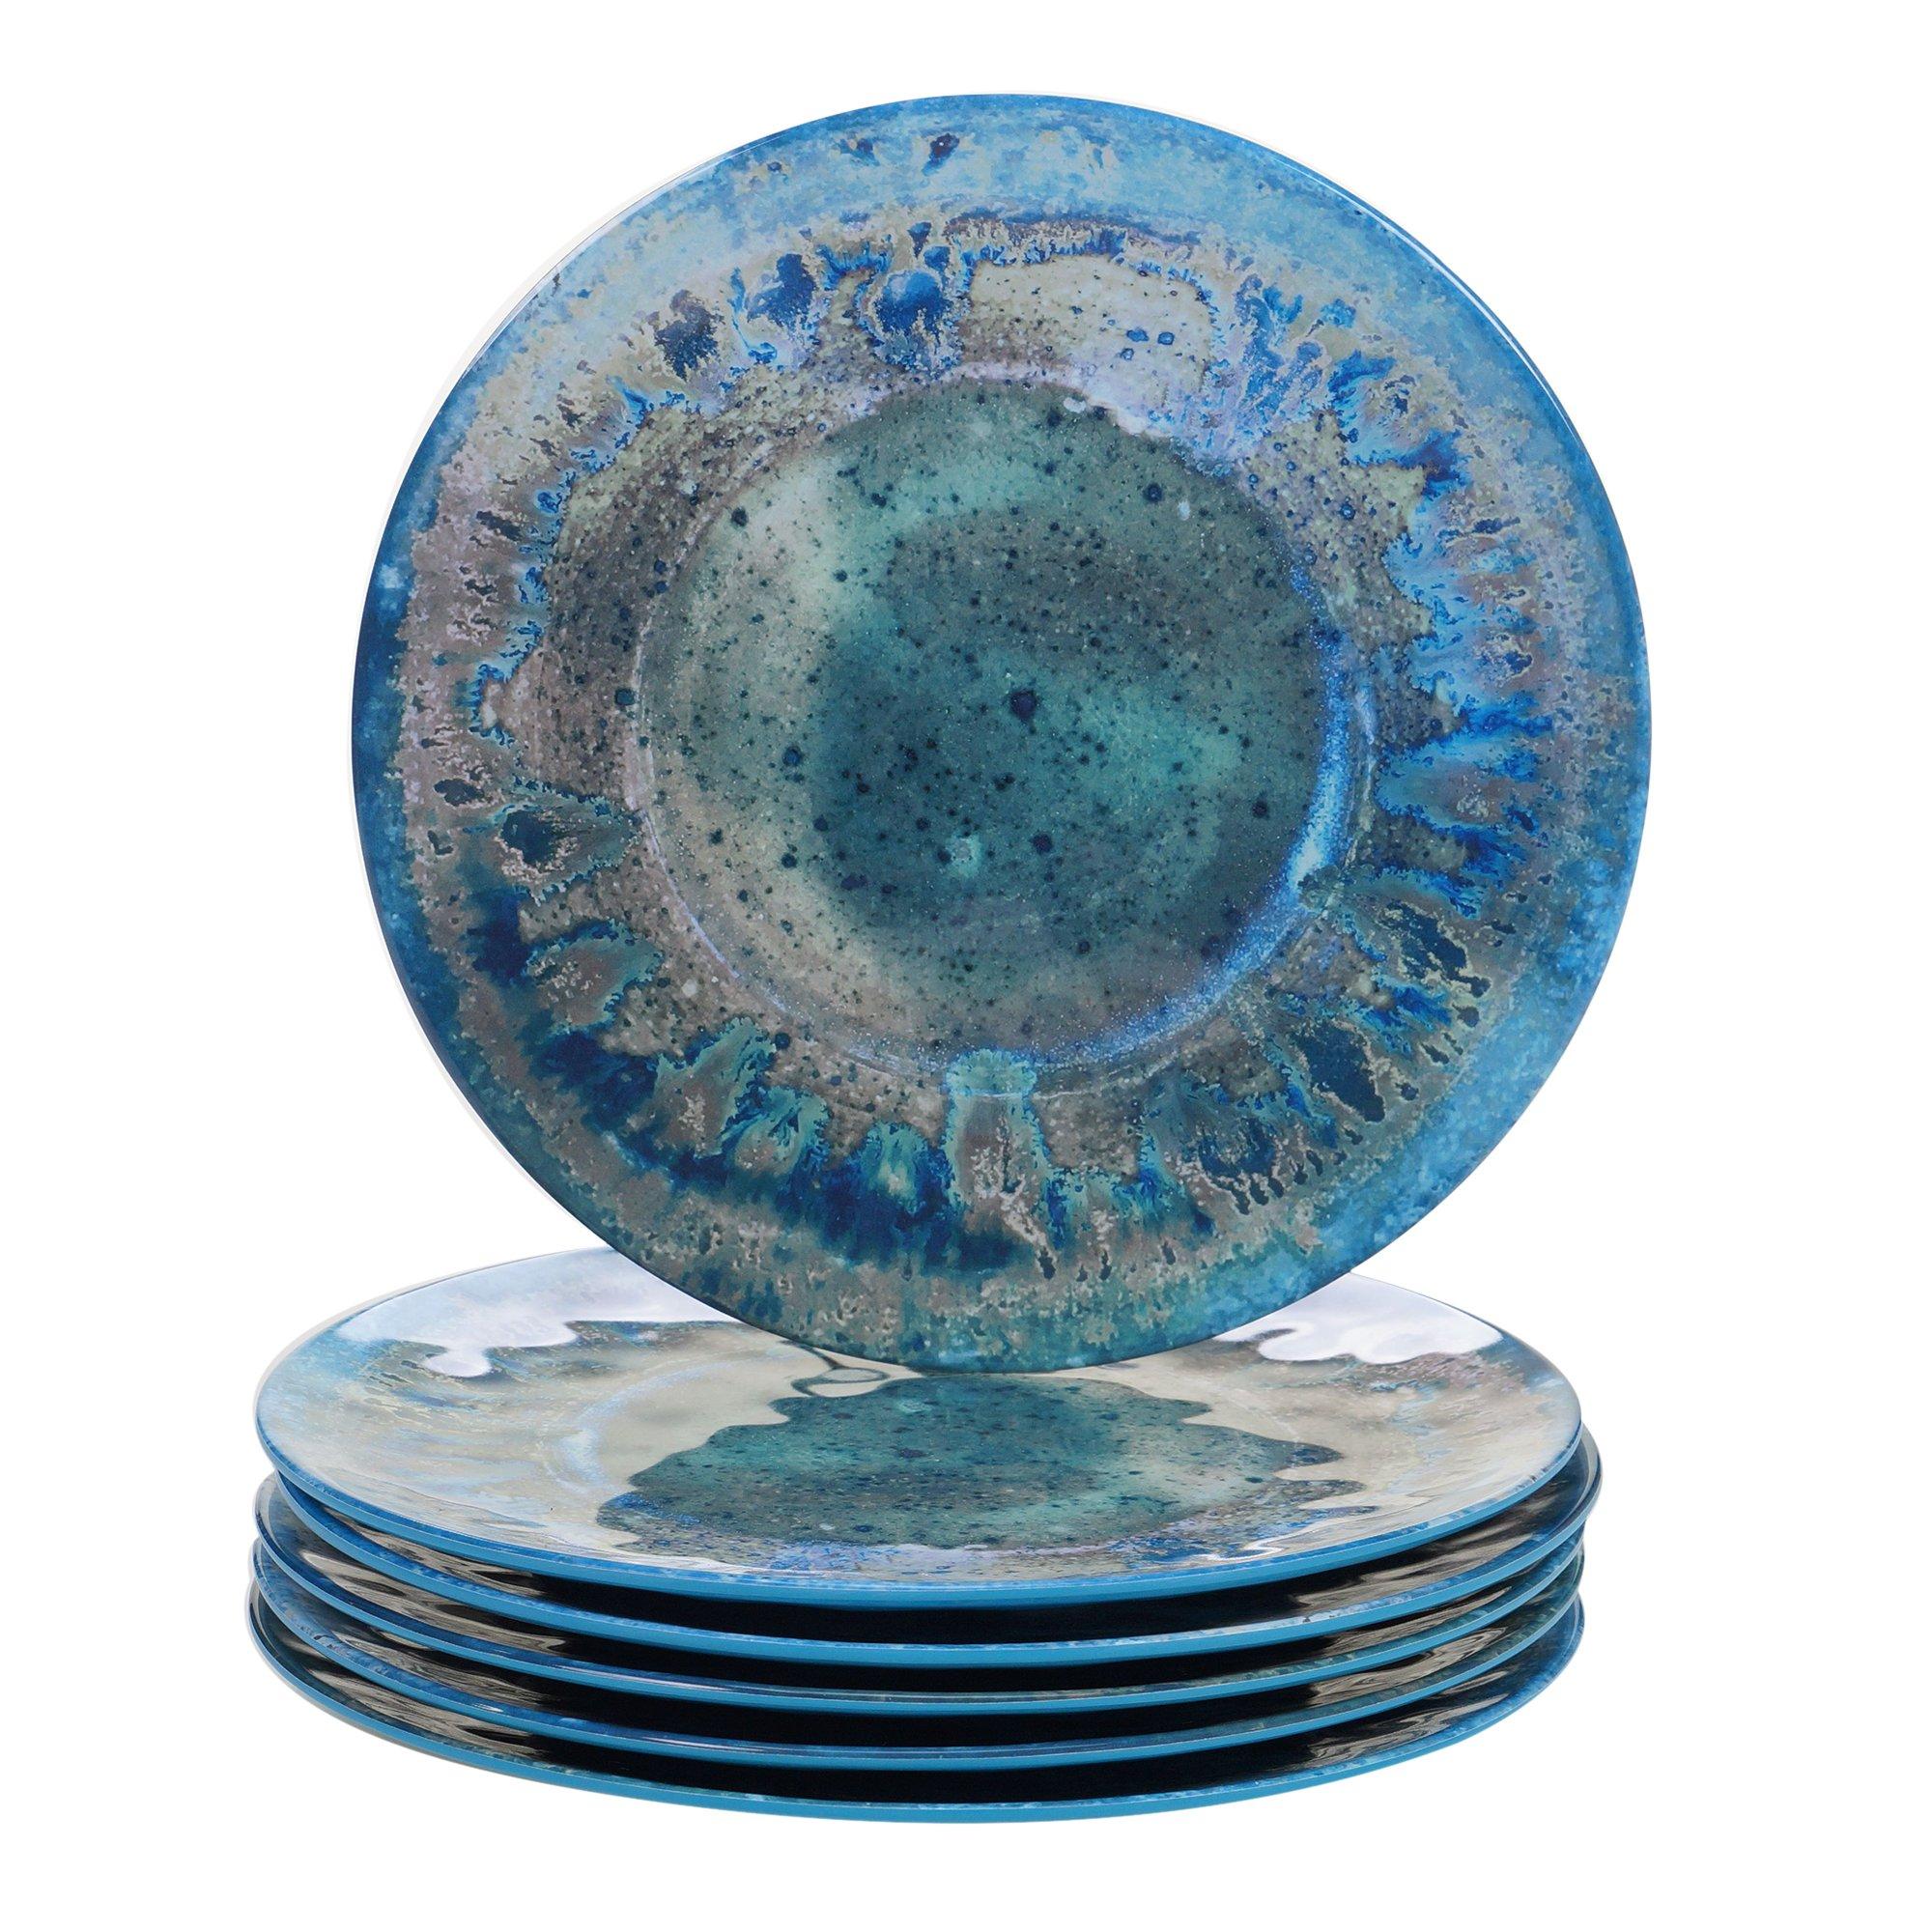 Certified International Radiance Teal Melamine 10.5'' Dinner Plate, Set of 6